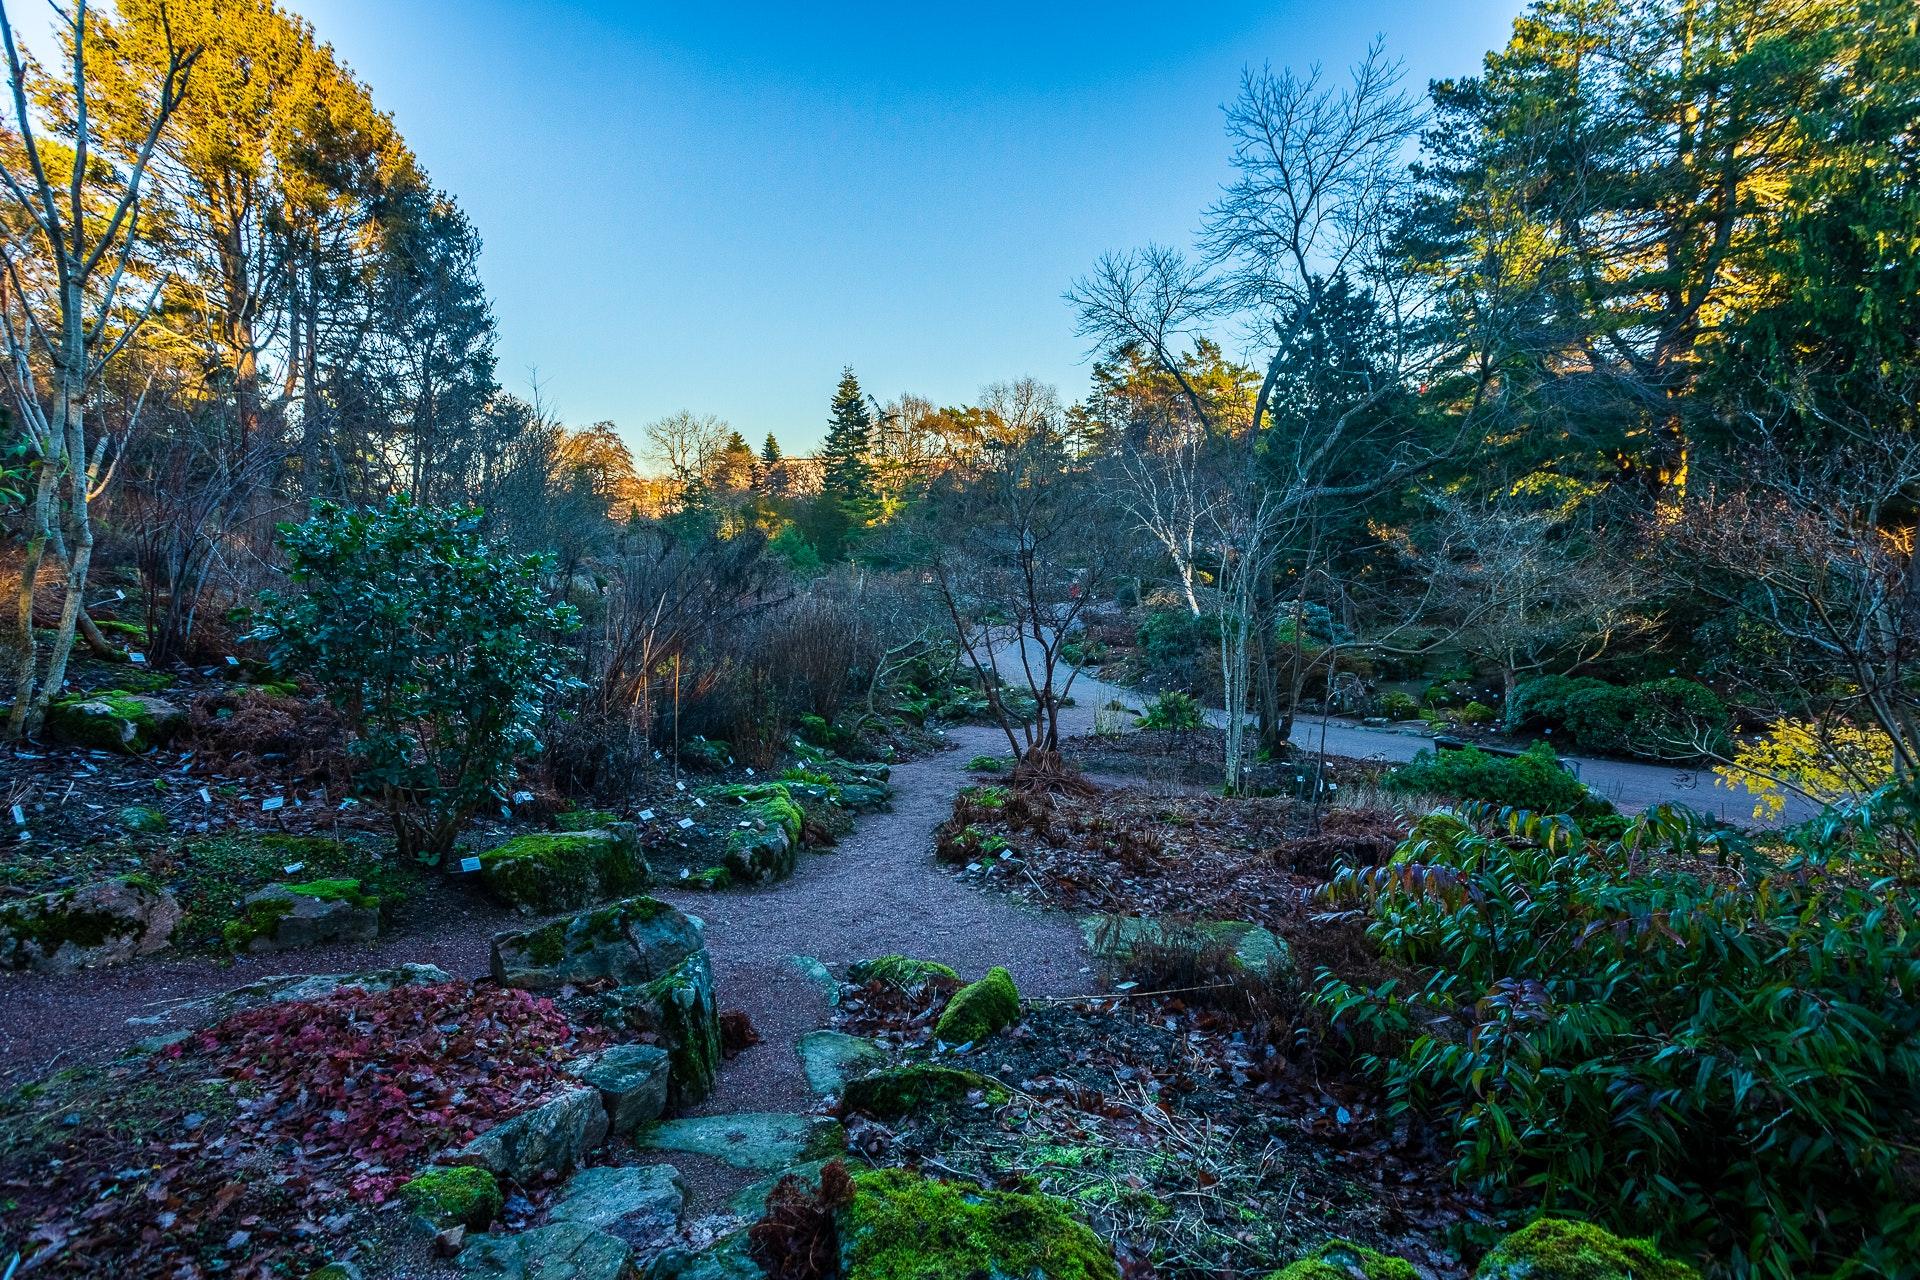 Göteborgs Botaniska Trädgård